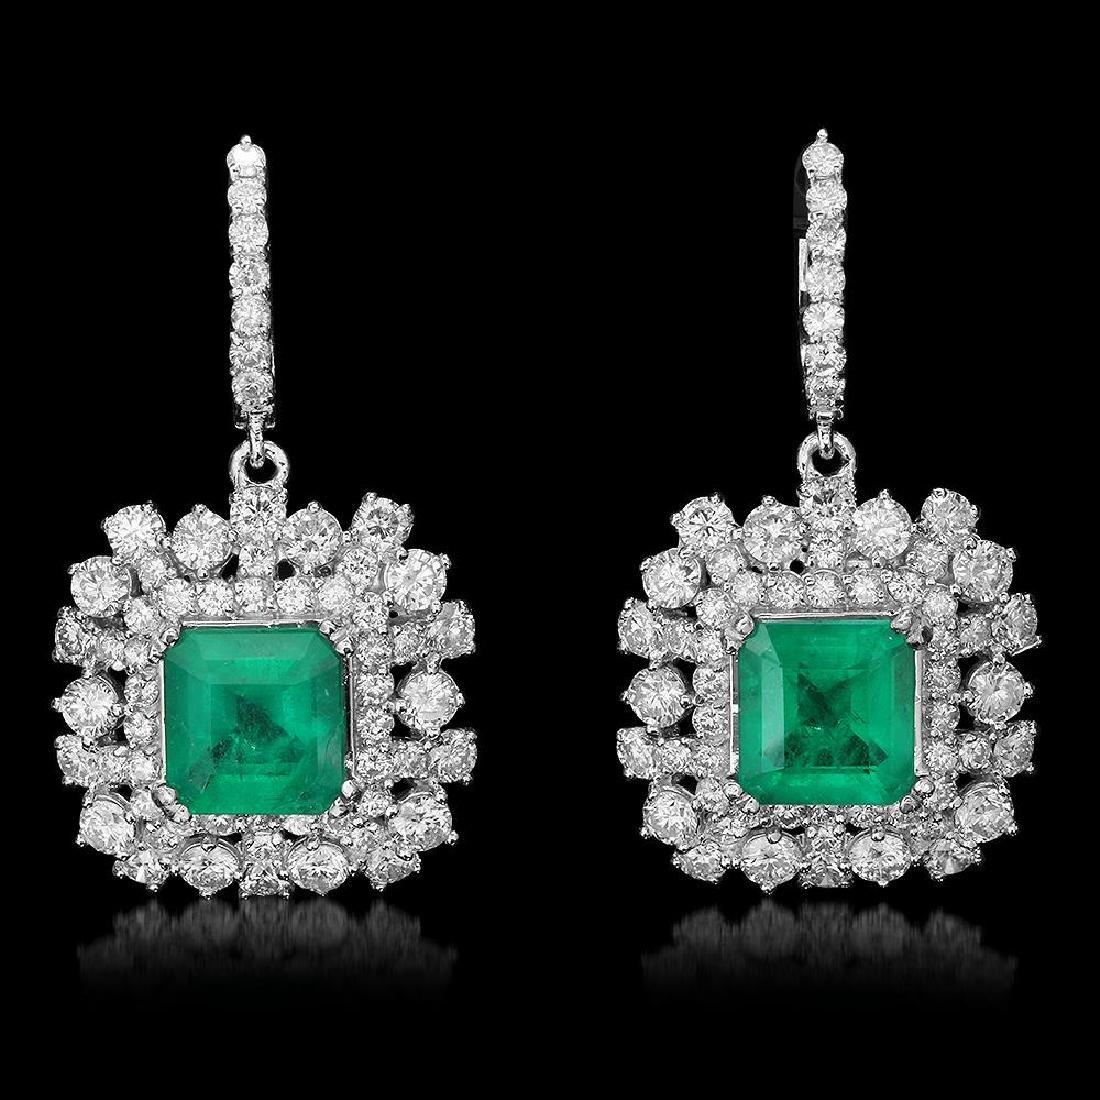 14K Gold 5.68ct Emerald 5.75ct Diamond Earrings